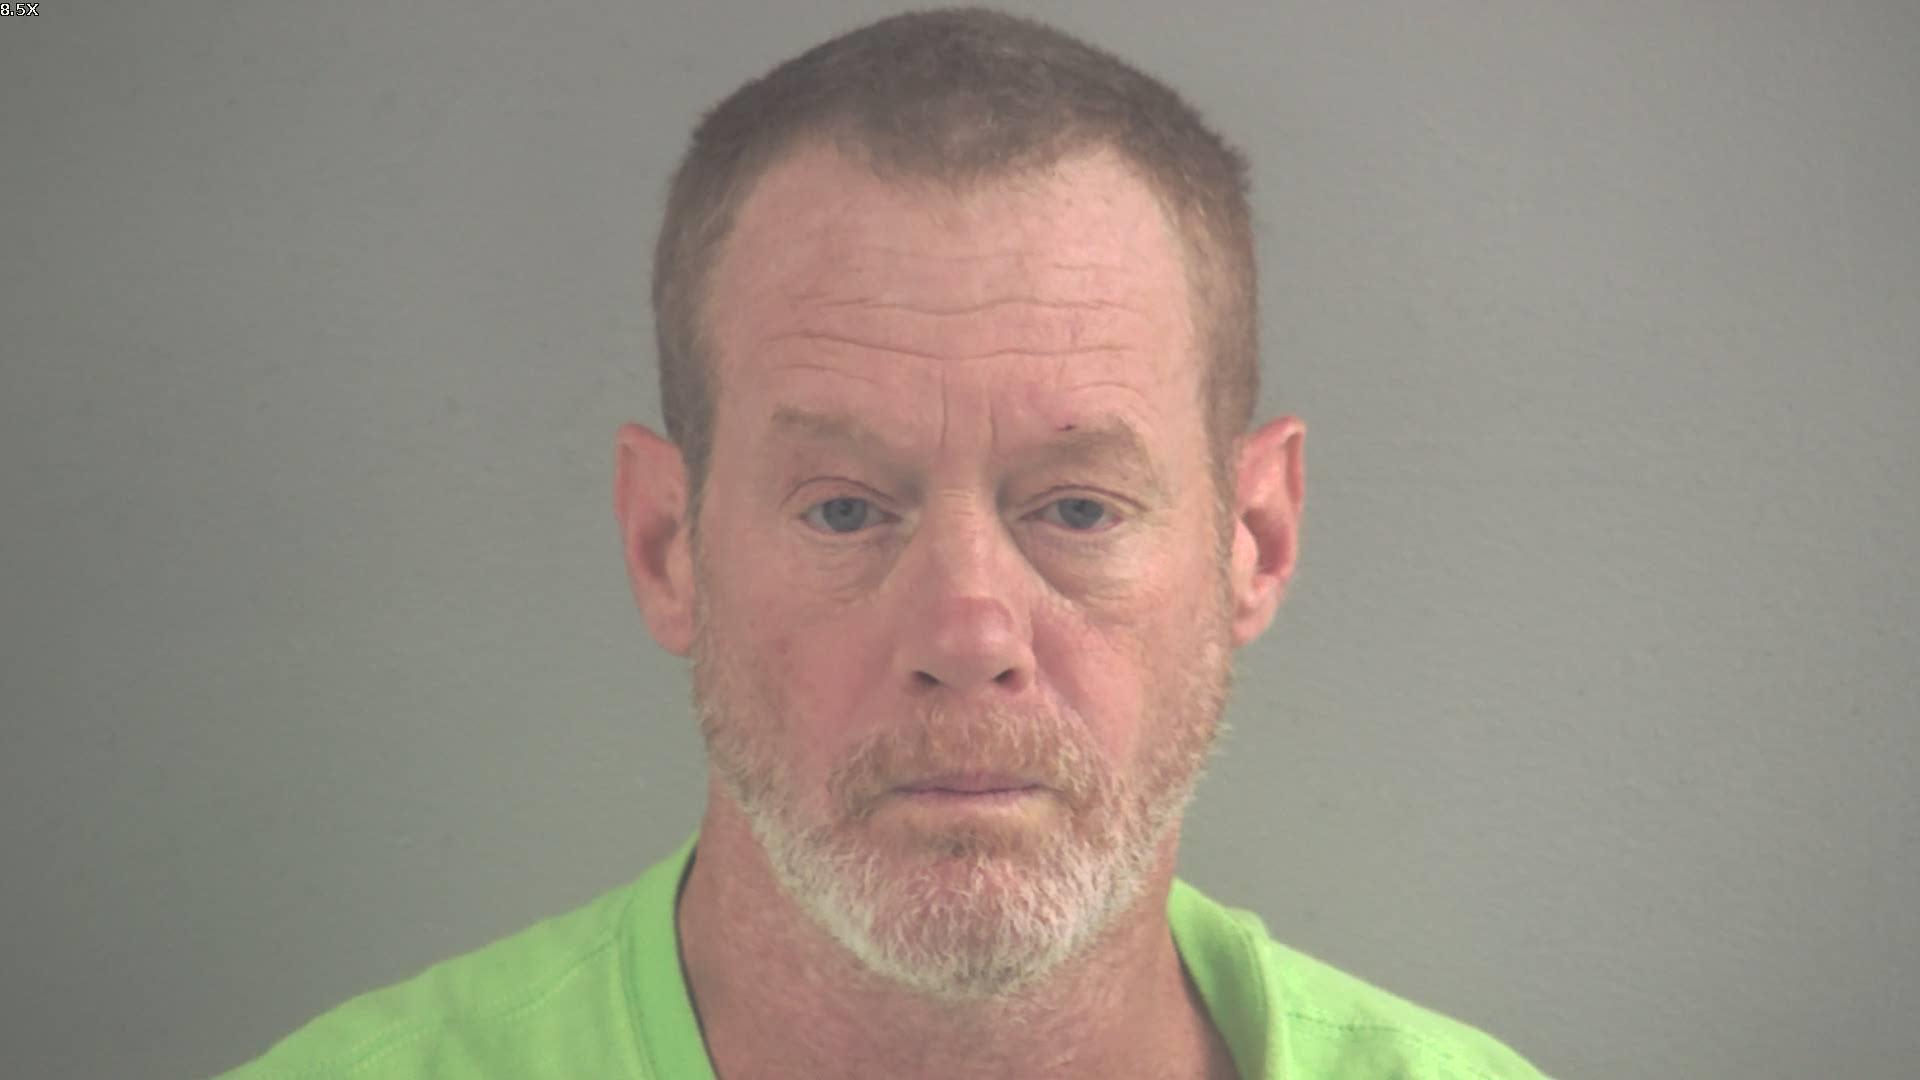 Logan Co. man accused of violating EPO, assaulting deputy